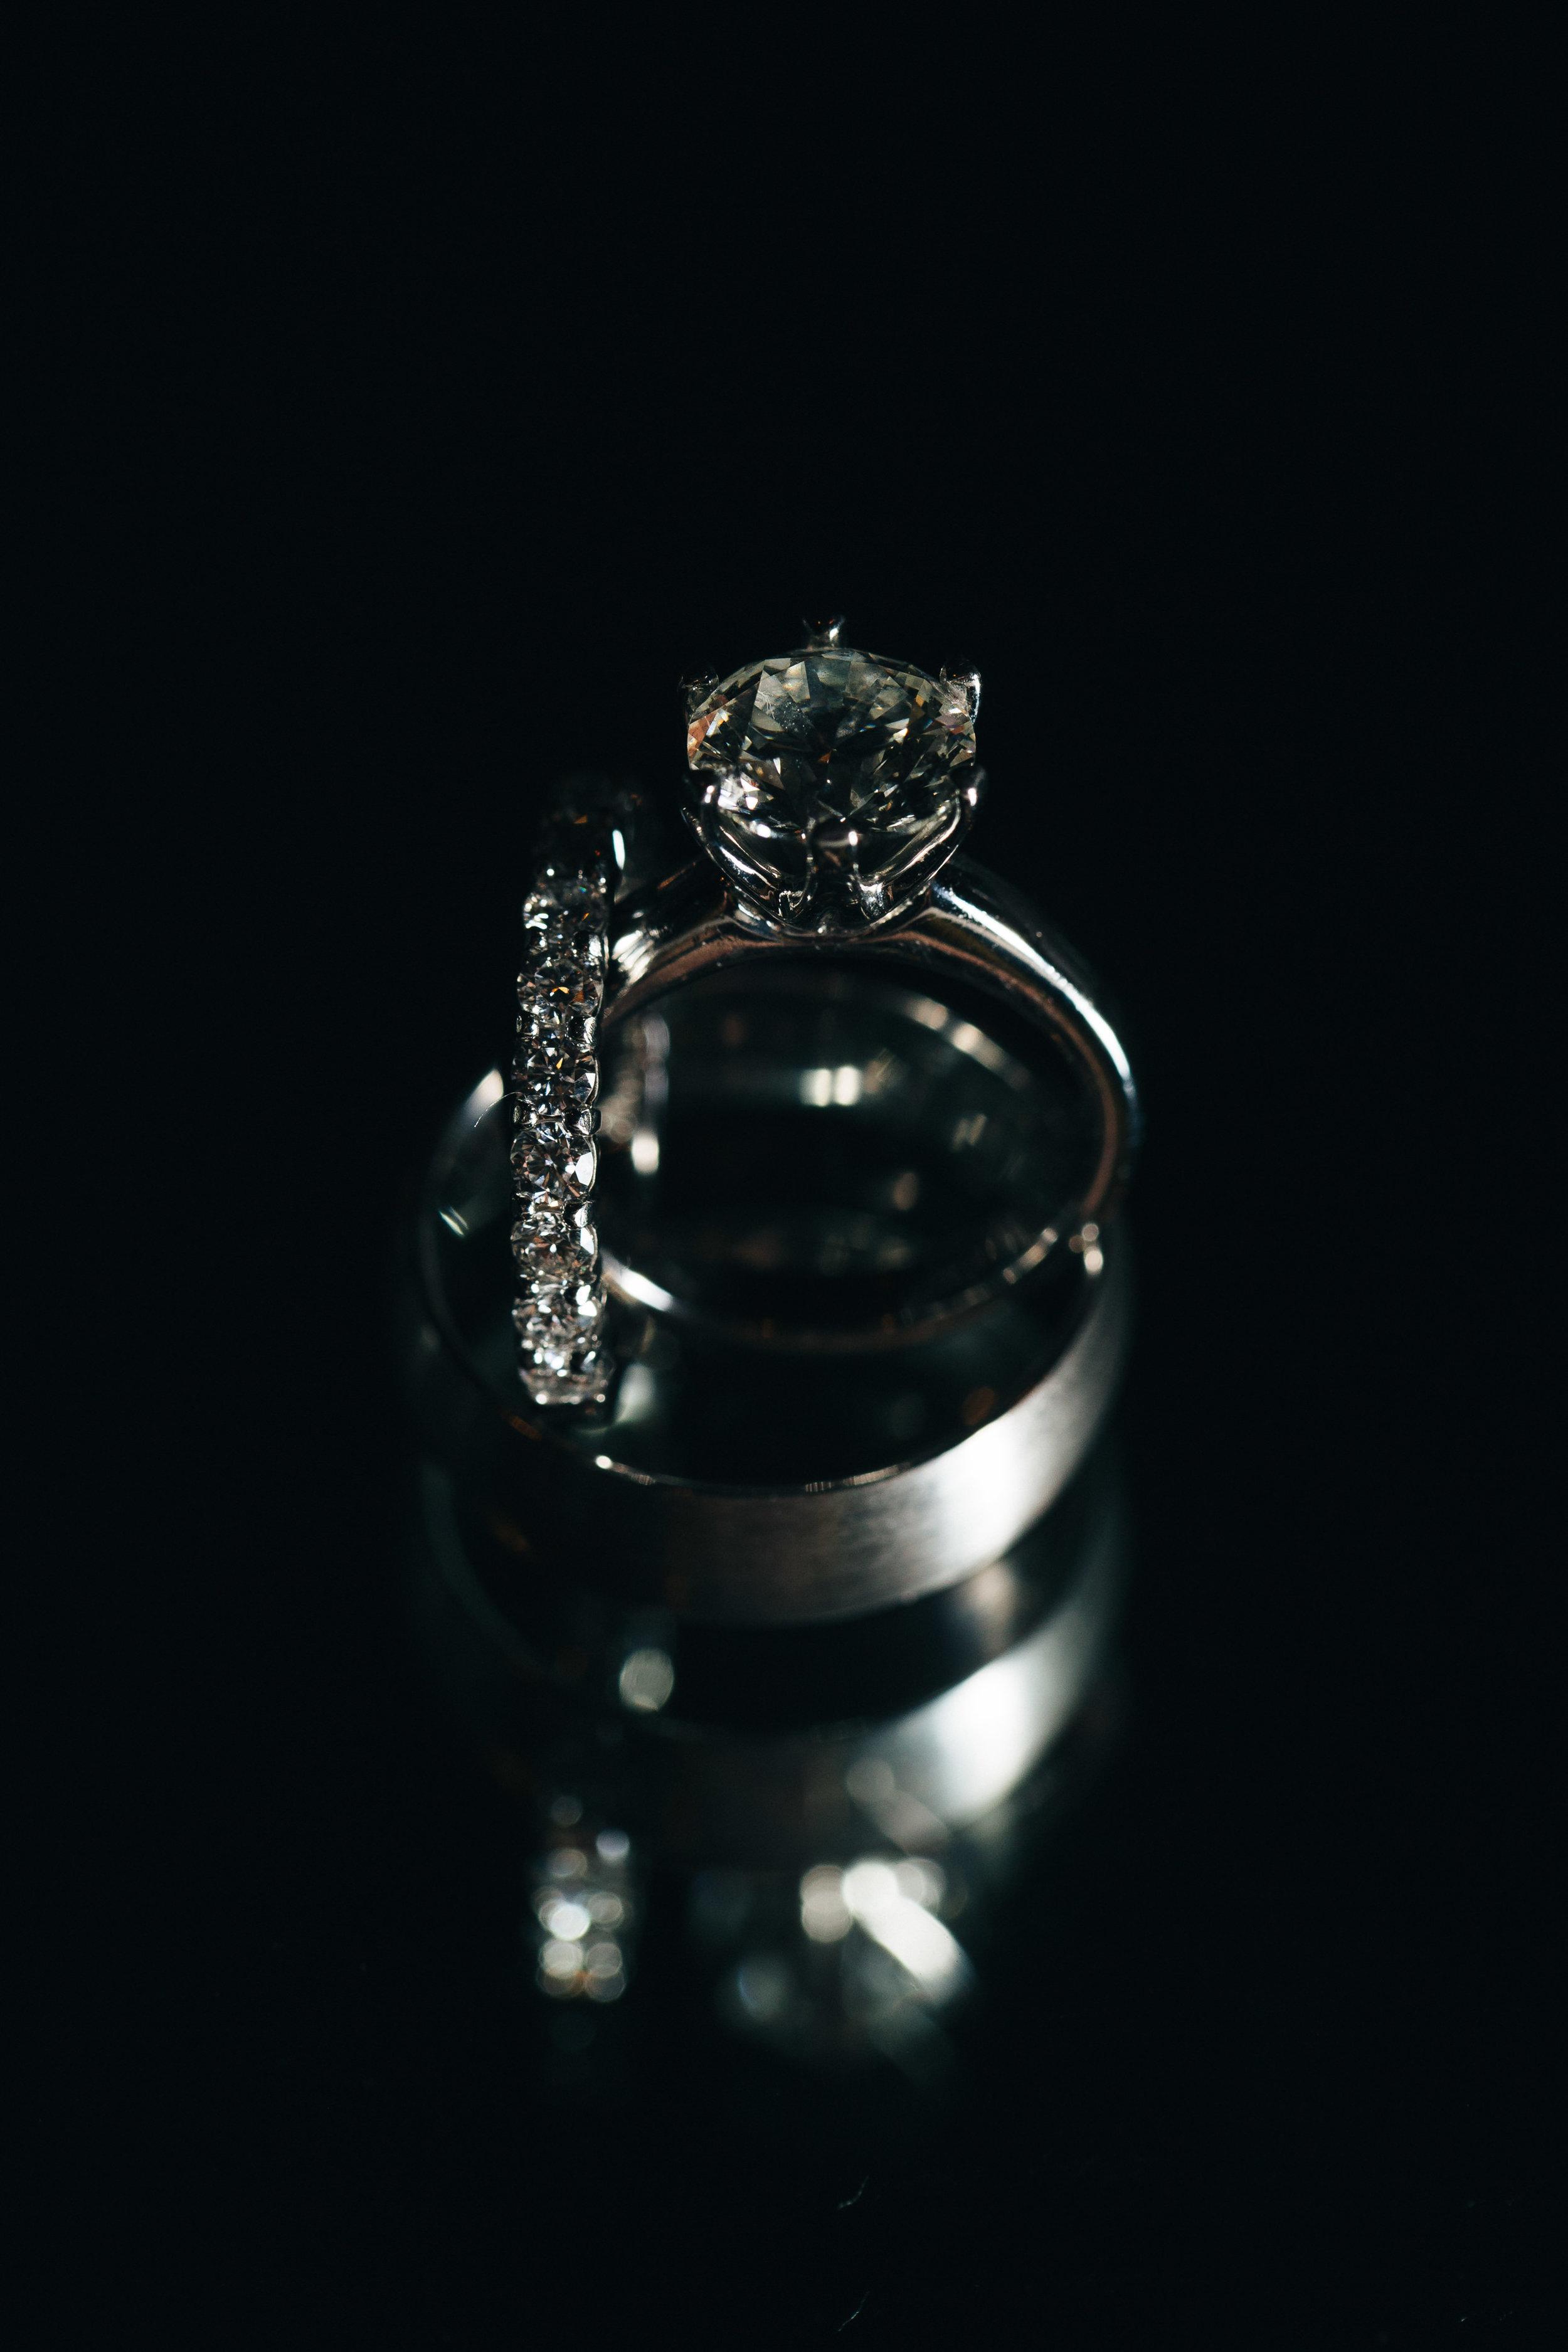 Wedding photography of diamond wedding ring.